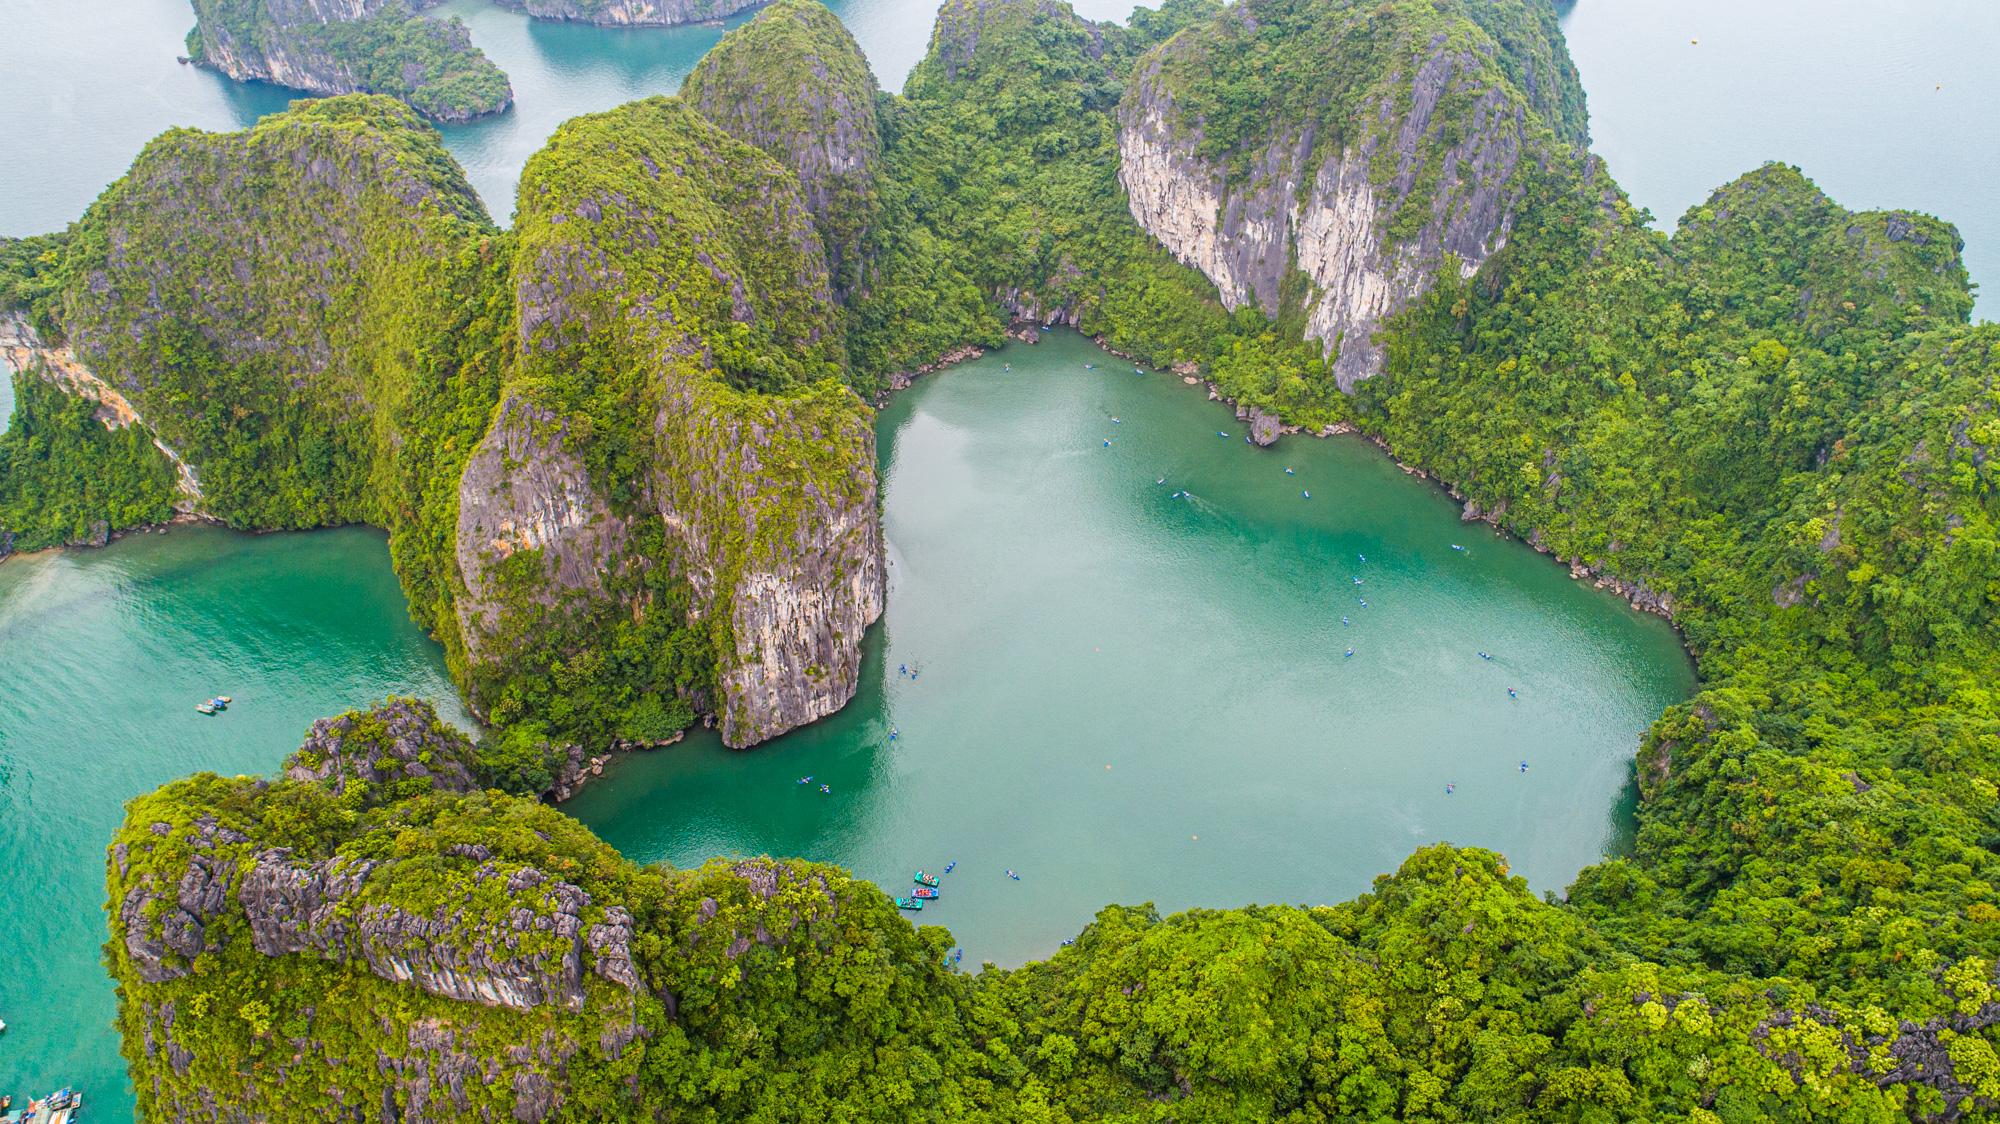 Bai Tu Long Bay from Above